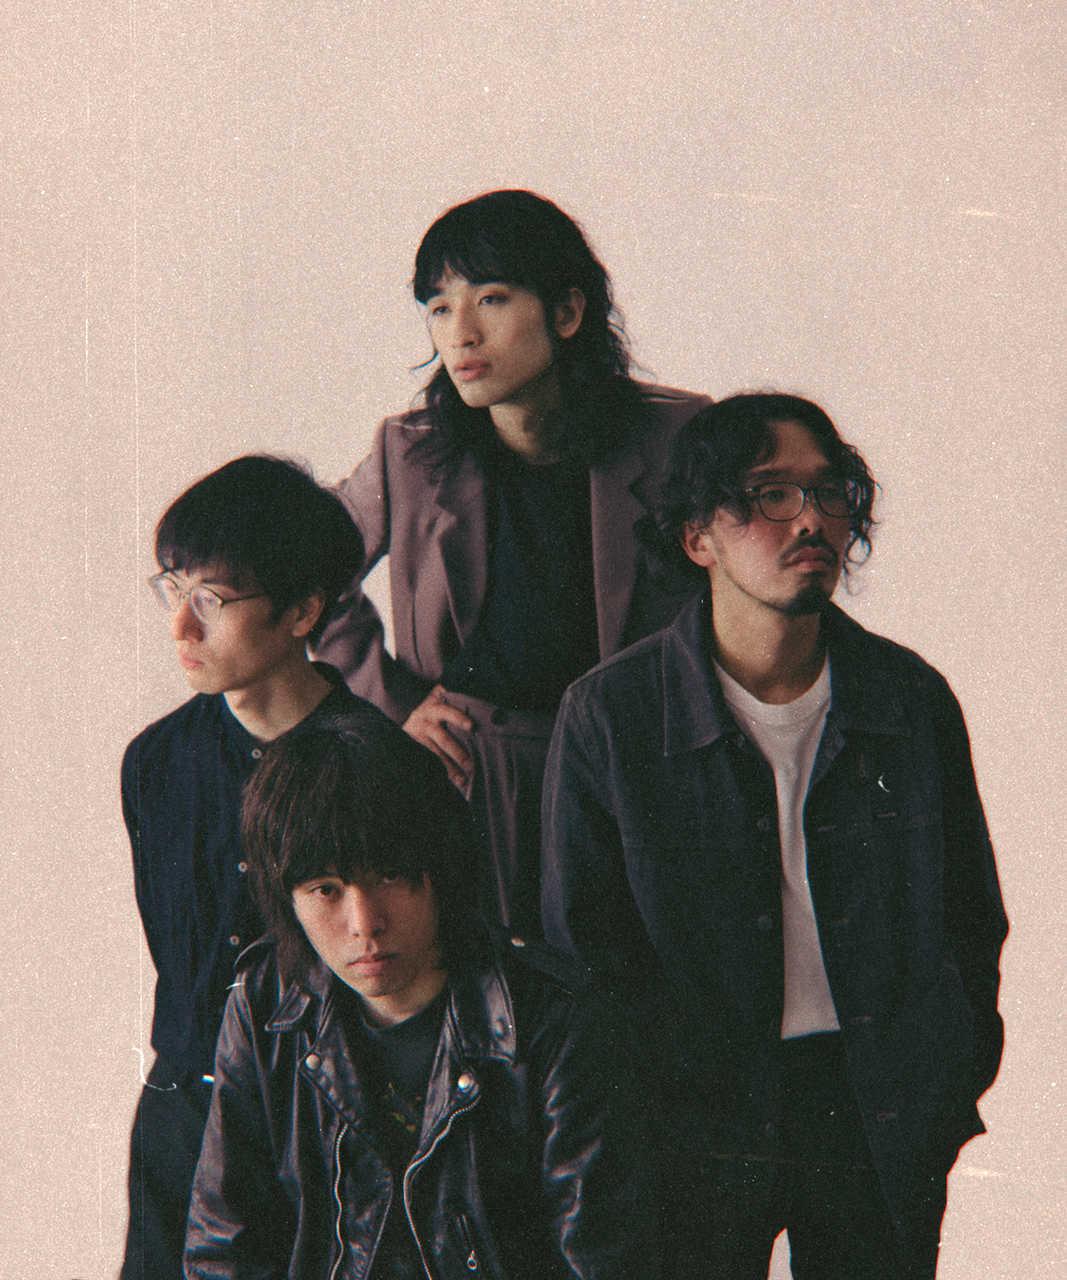 Newdums、中毒性高めのチルいアルバム「N.N.N.」がついに発売!